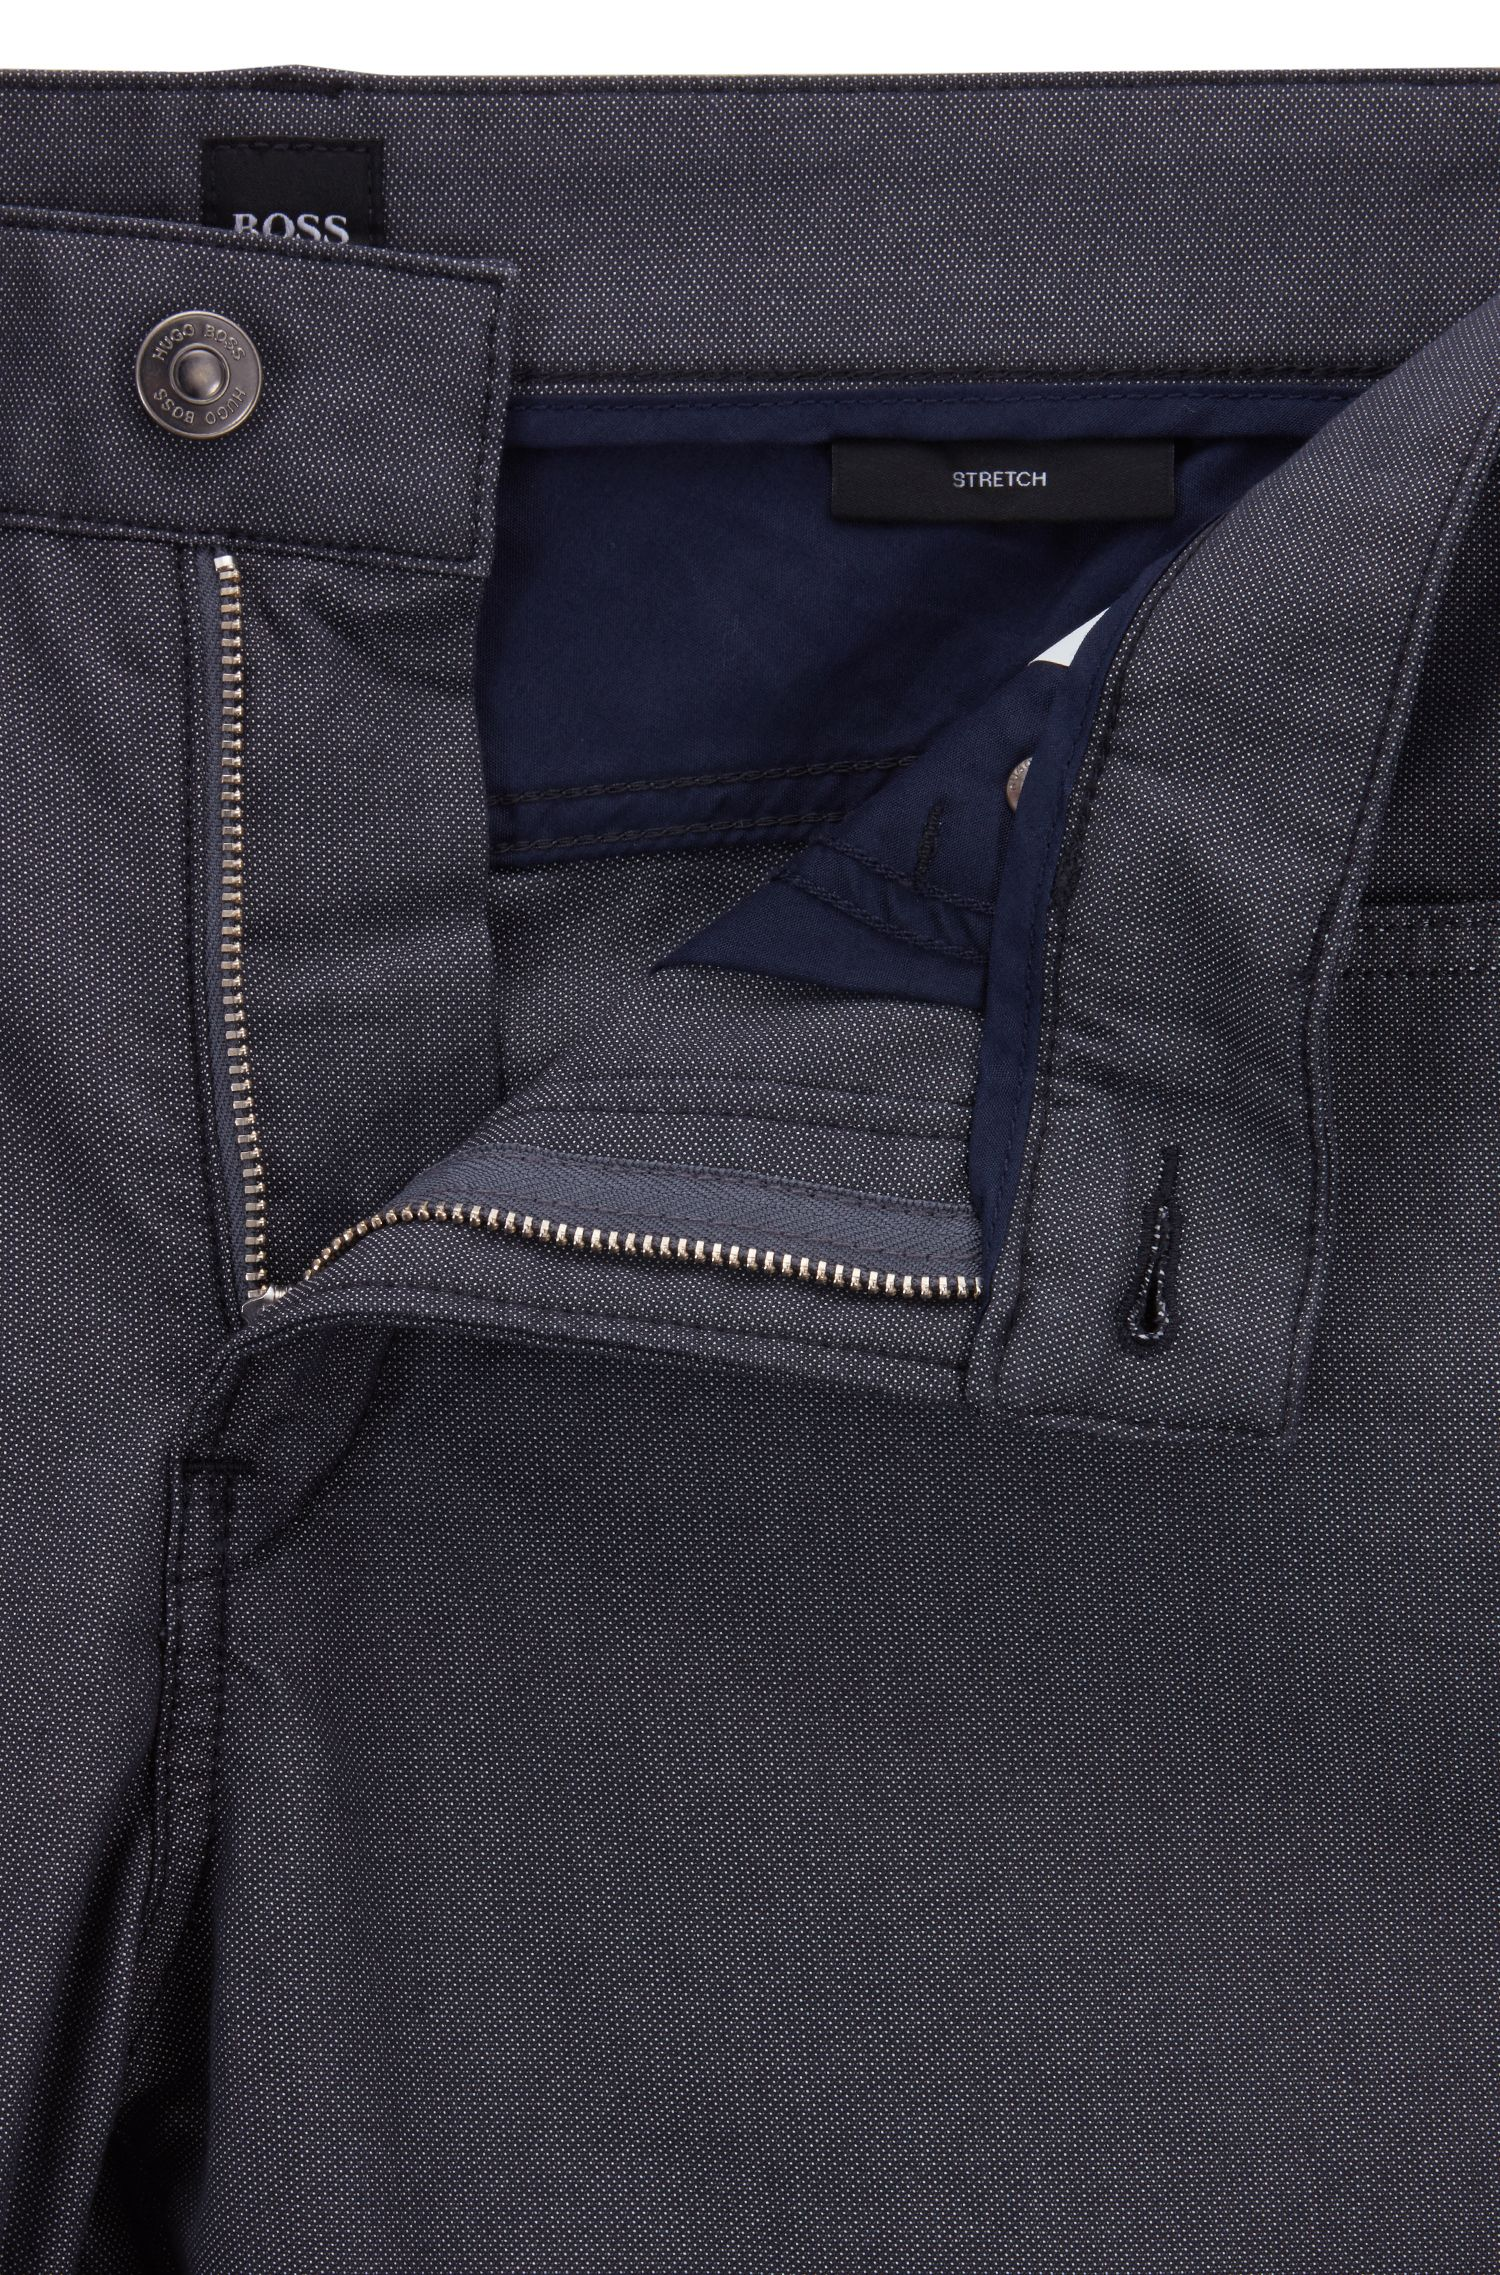 Slim-Fit Jeans aus zweifarbigem Stretch-Denim, Dunkelblau